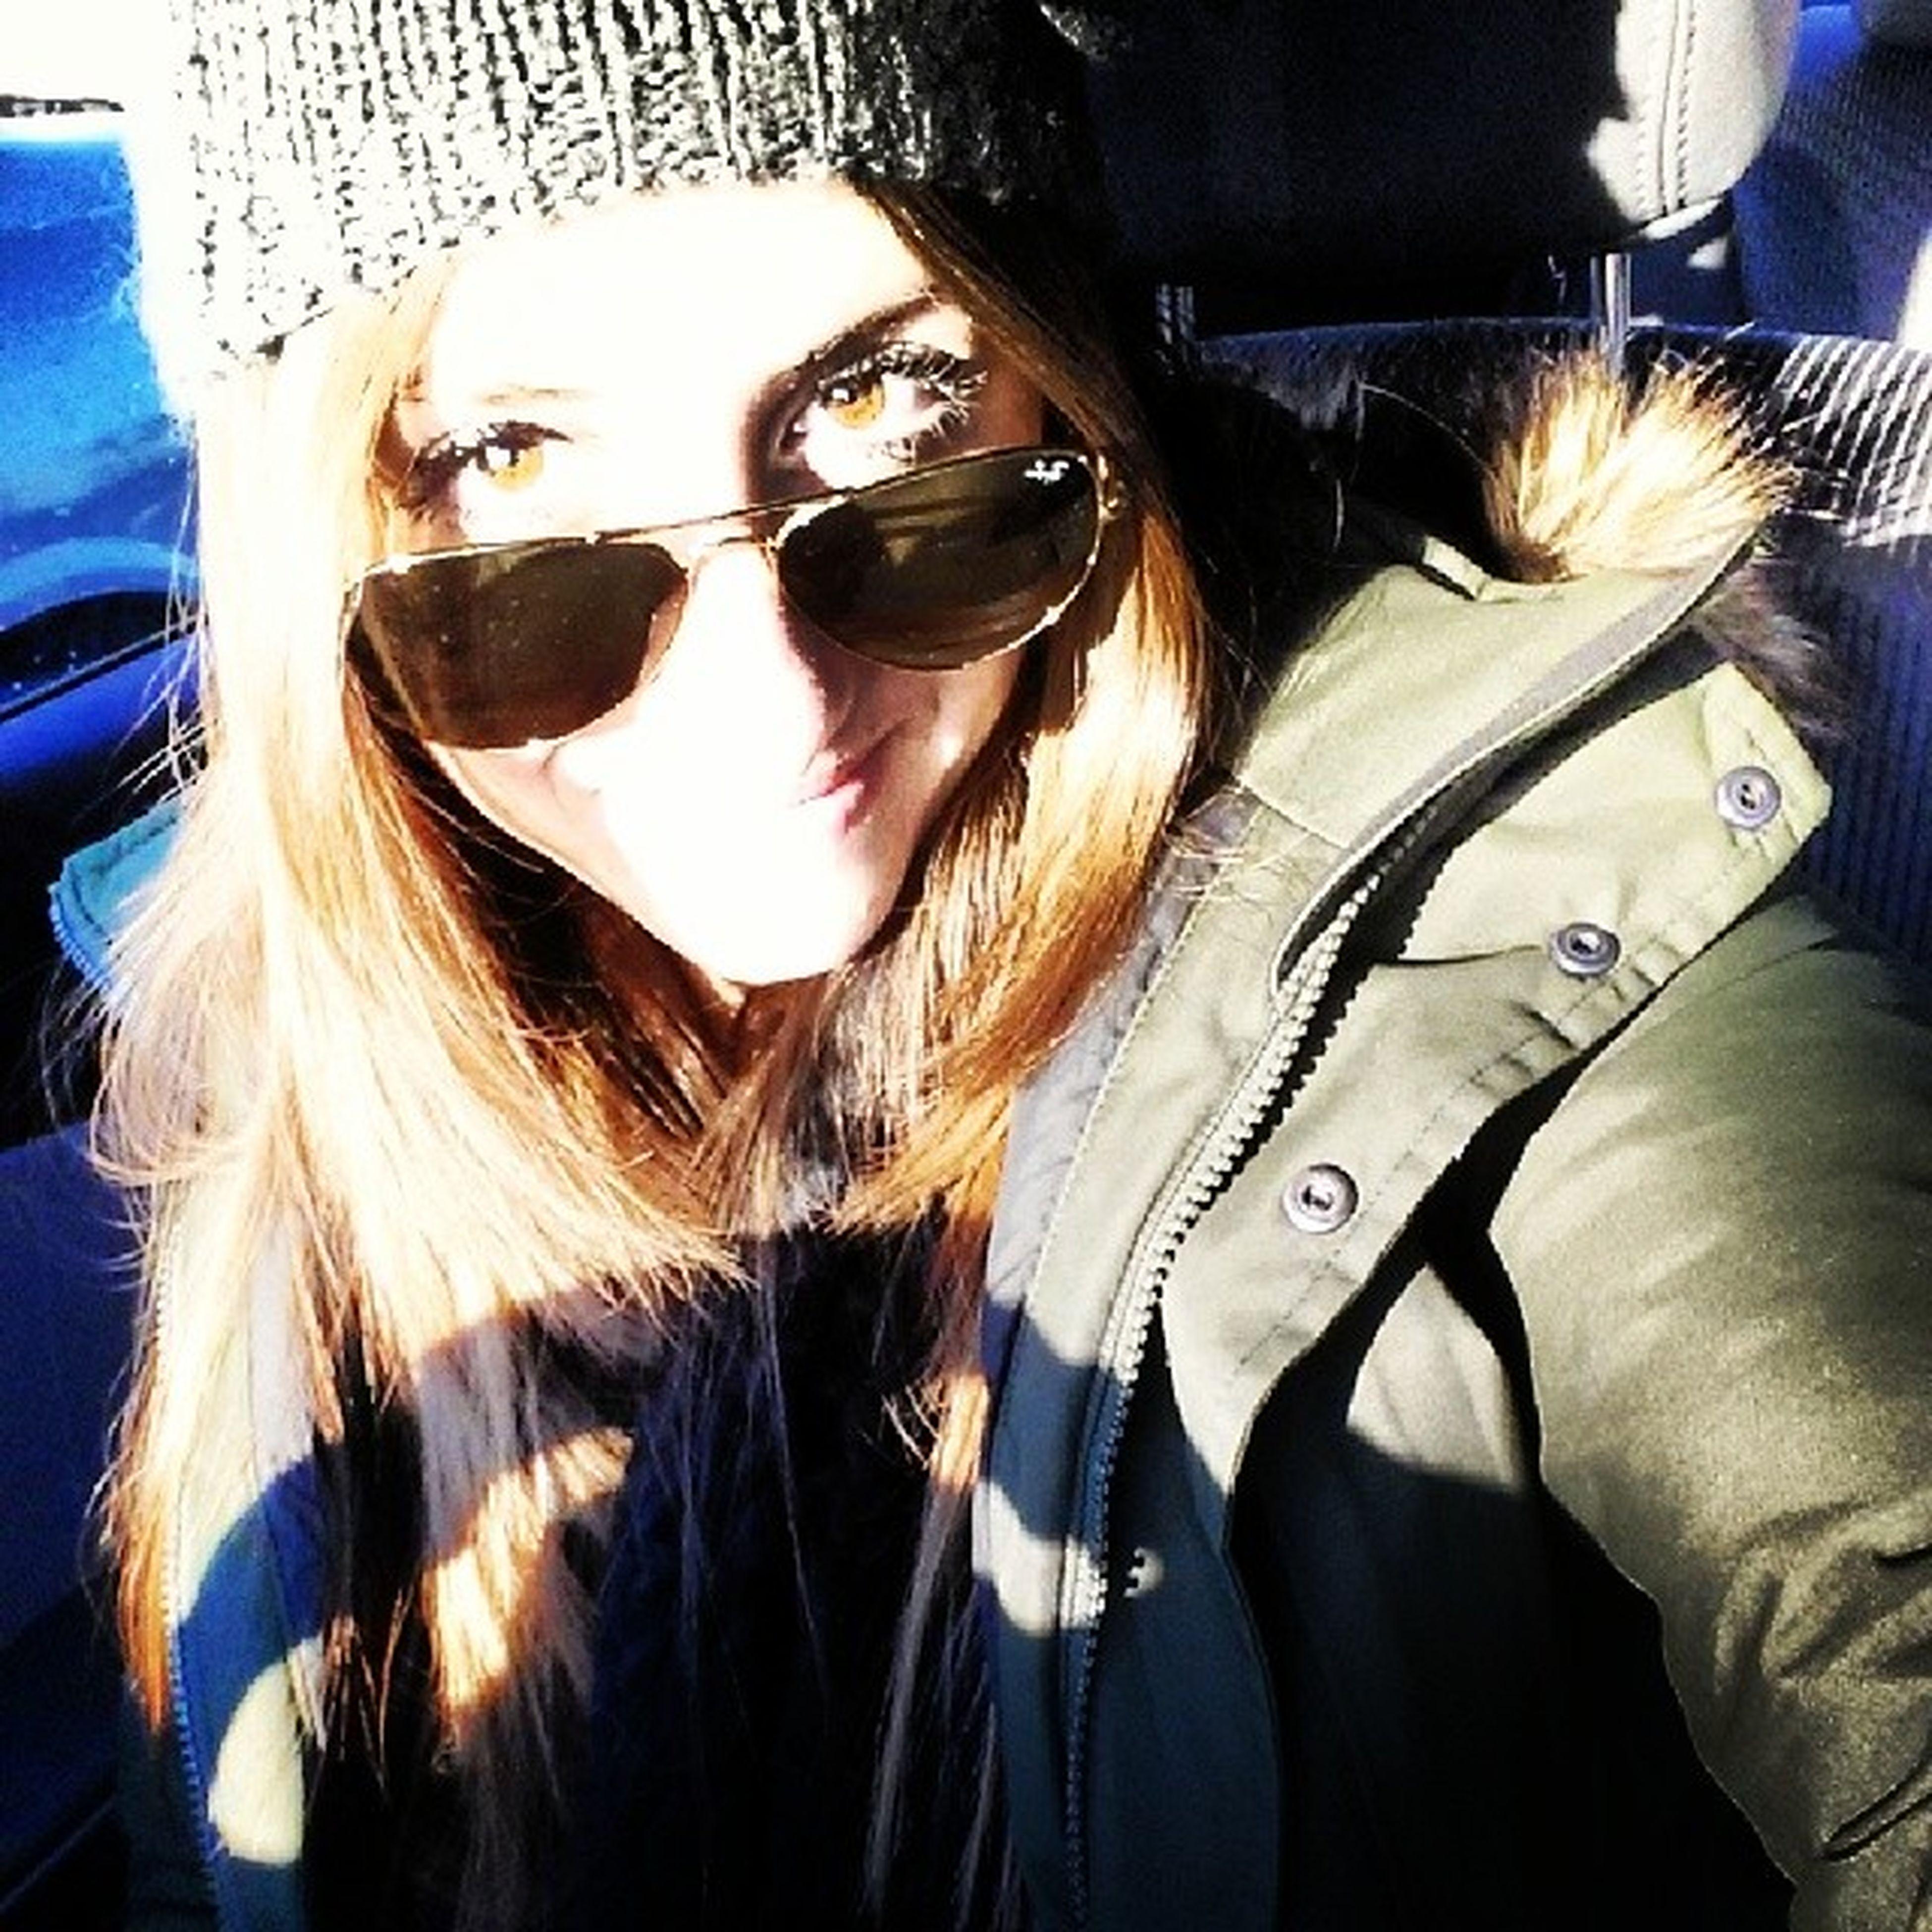 Oh those winter days Merp. Sunnies Bigeyes Selfietuesday Sunnyinmtl shabang